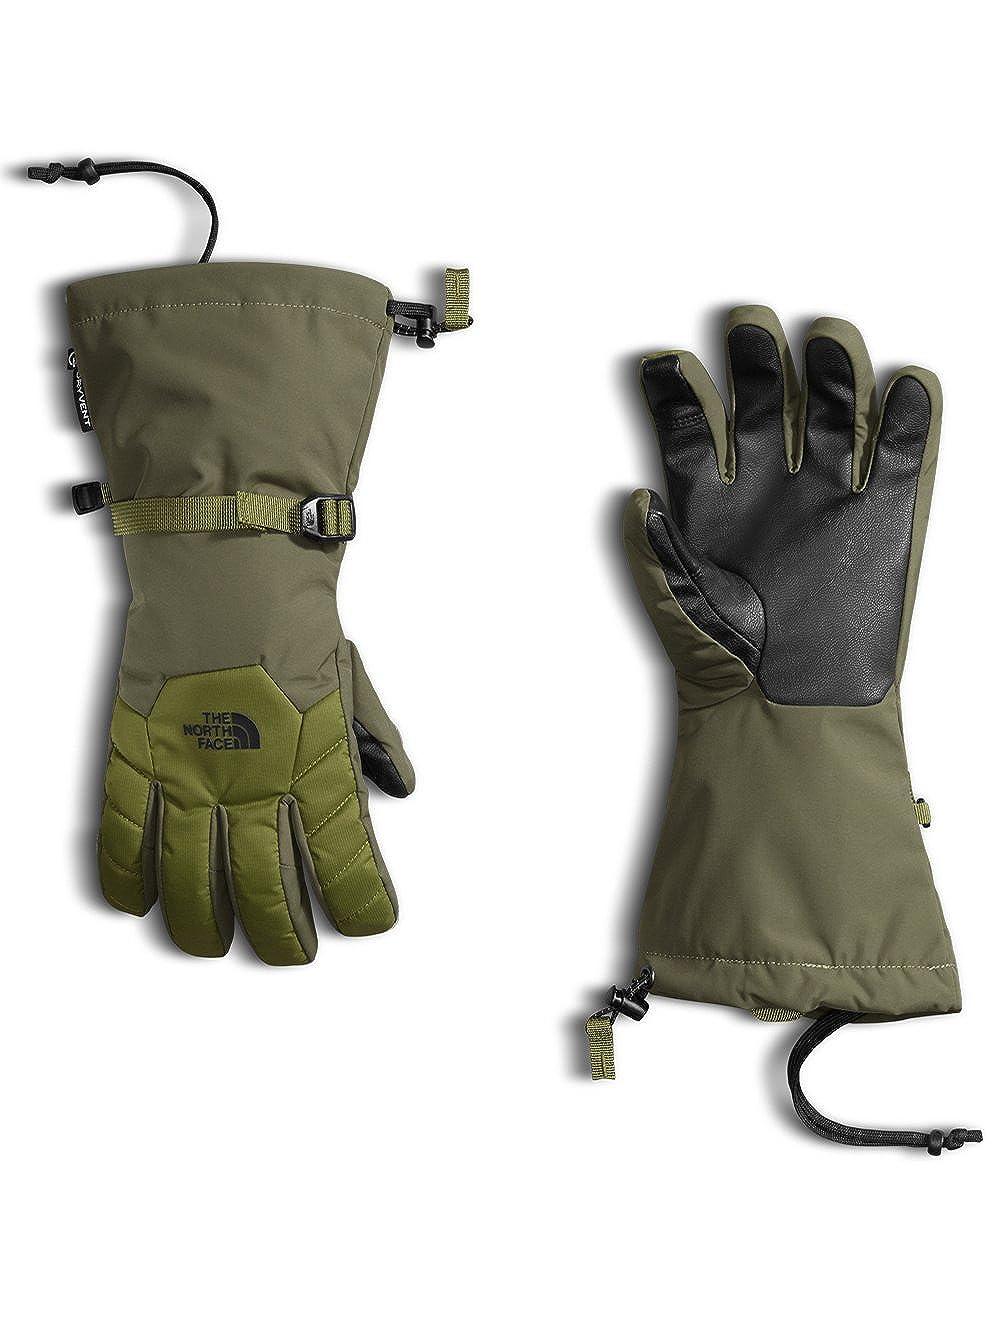 b466643c7 The North Face Boys' Revelstoke Etip Glove (Sizes S - L)